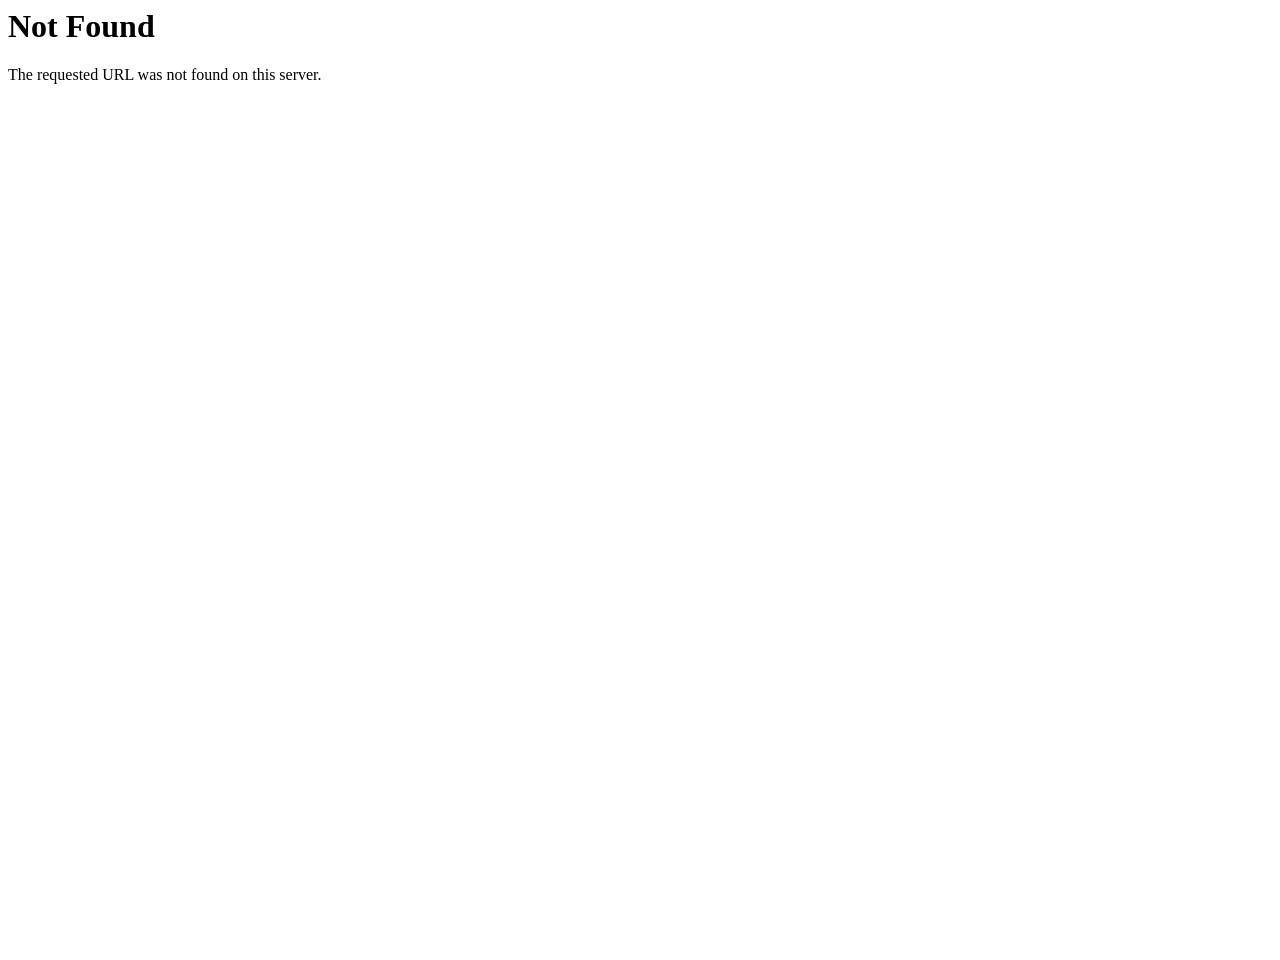 HOME|荒木屋|埼玉県深谷市にあるまちのお酒屋さんです。飲食業の方一般家庭のお客様どちらも大歓迎です!